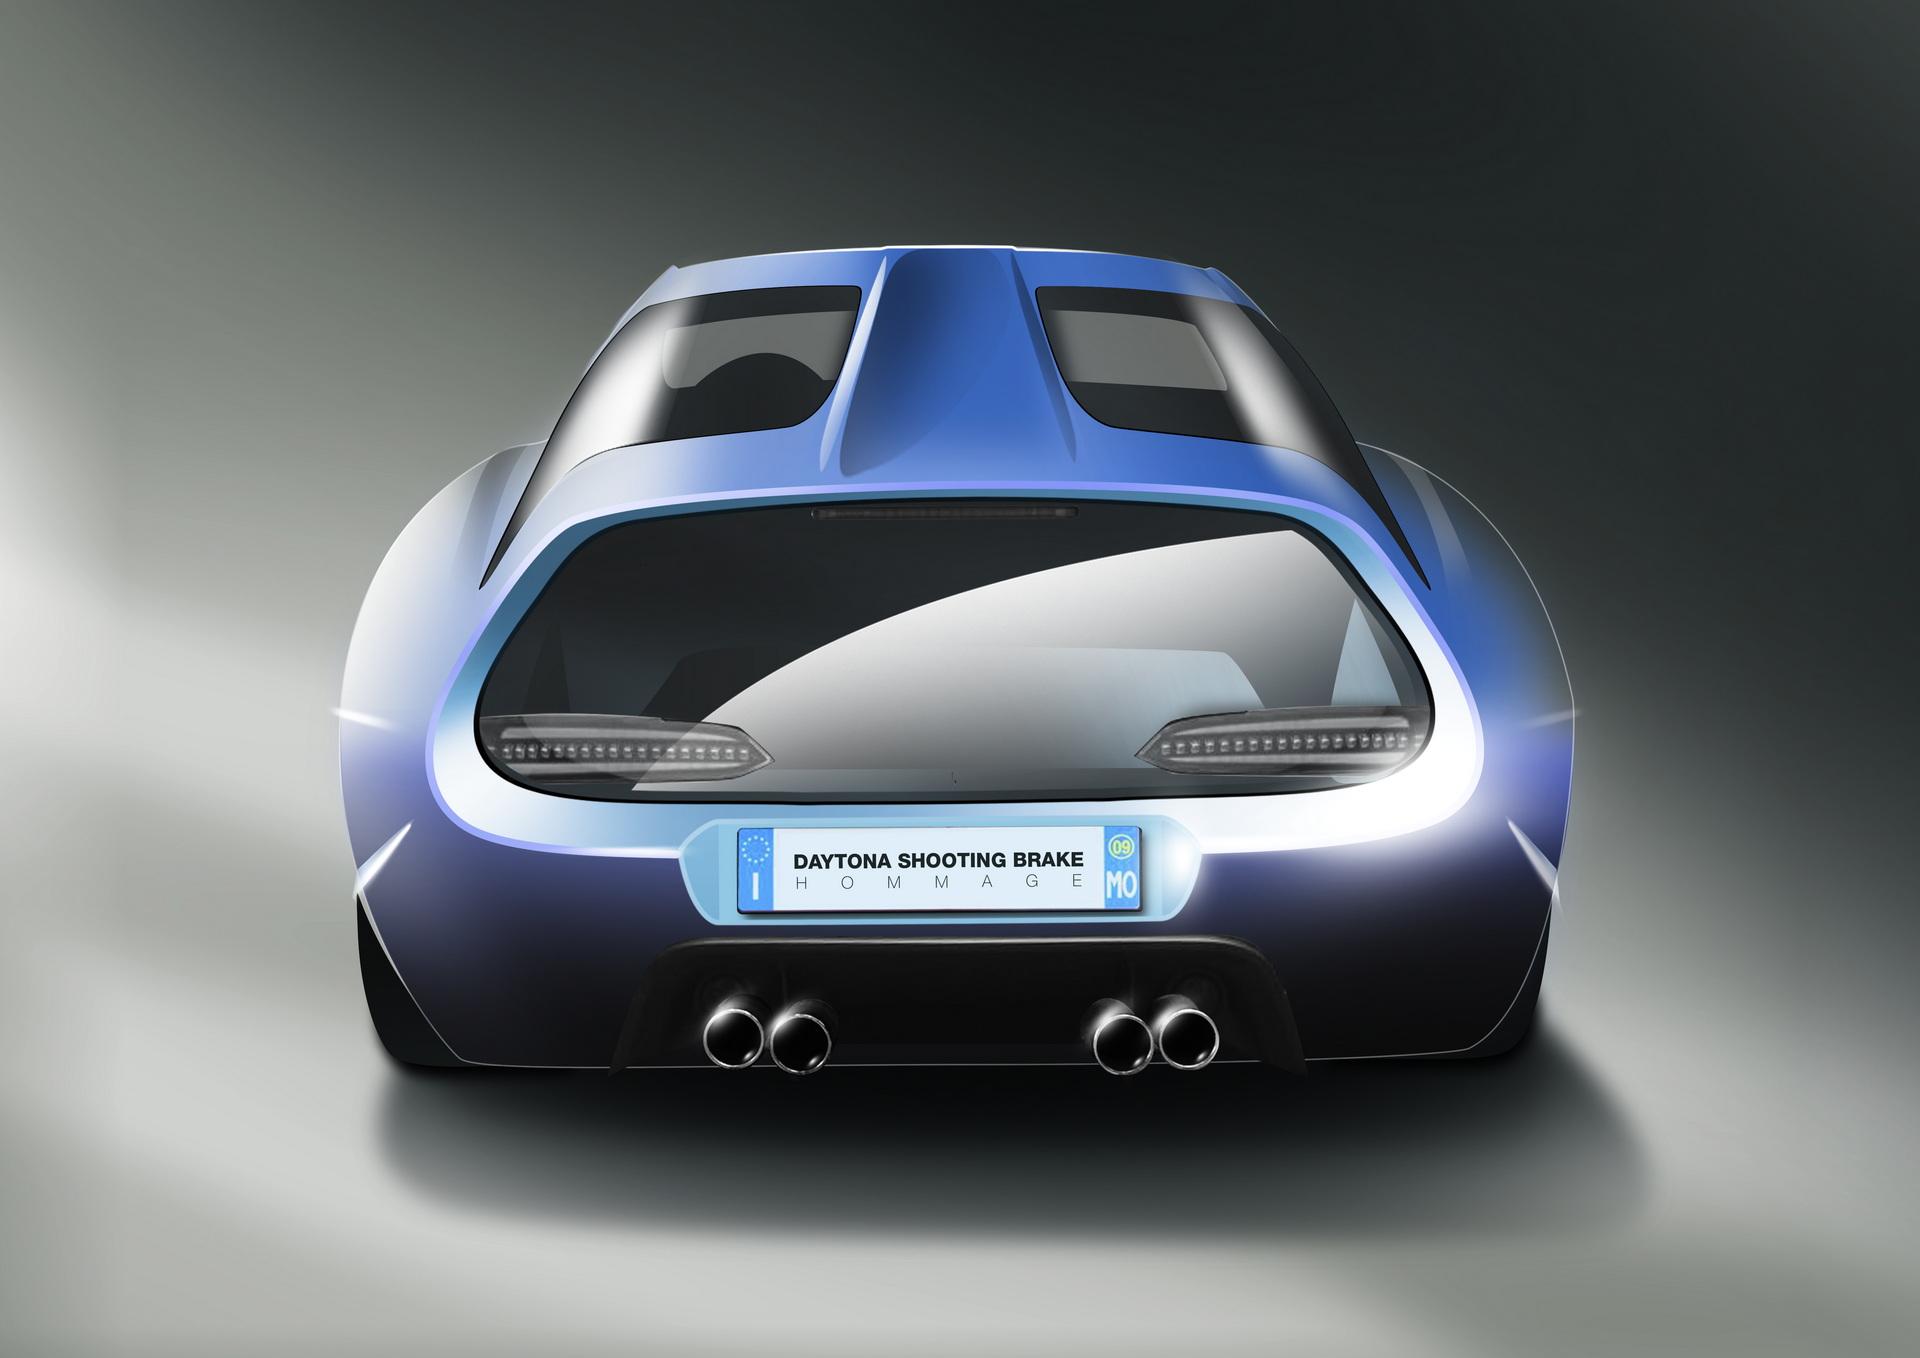 Ferrari-Daytona-Shooting-Brake-Hommage-by-Niels-van-Roij-Design-28